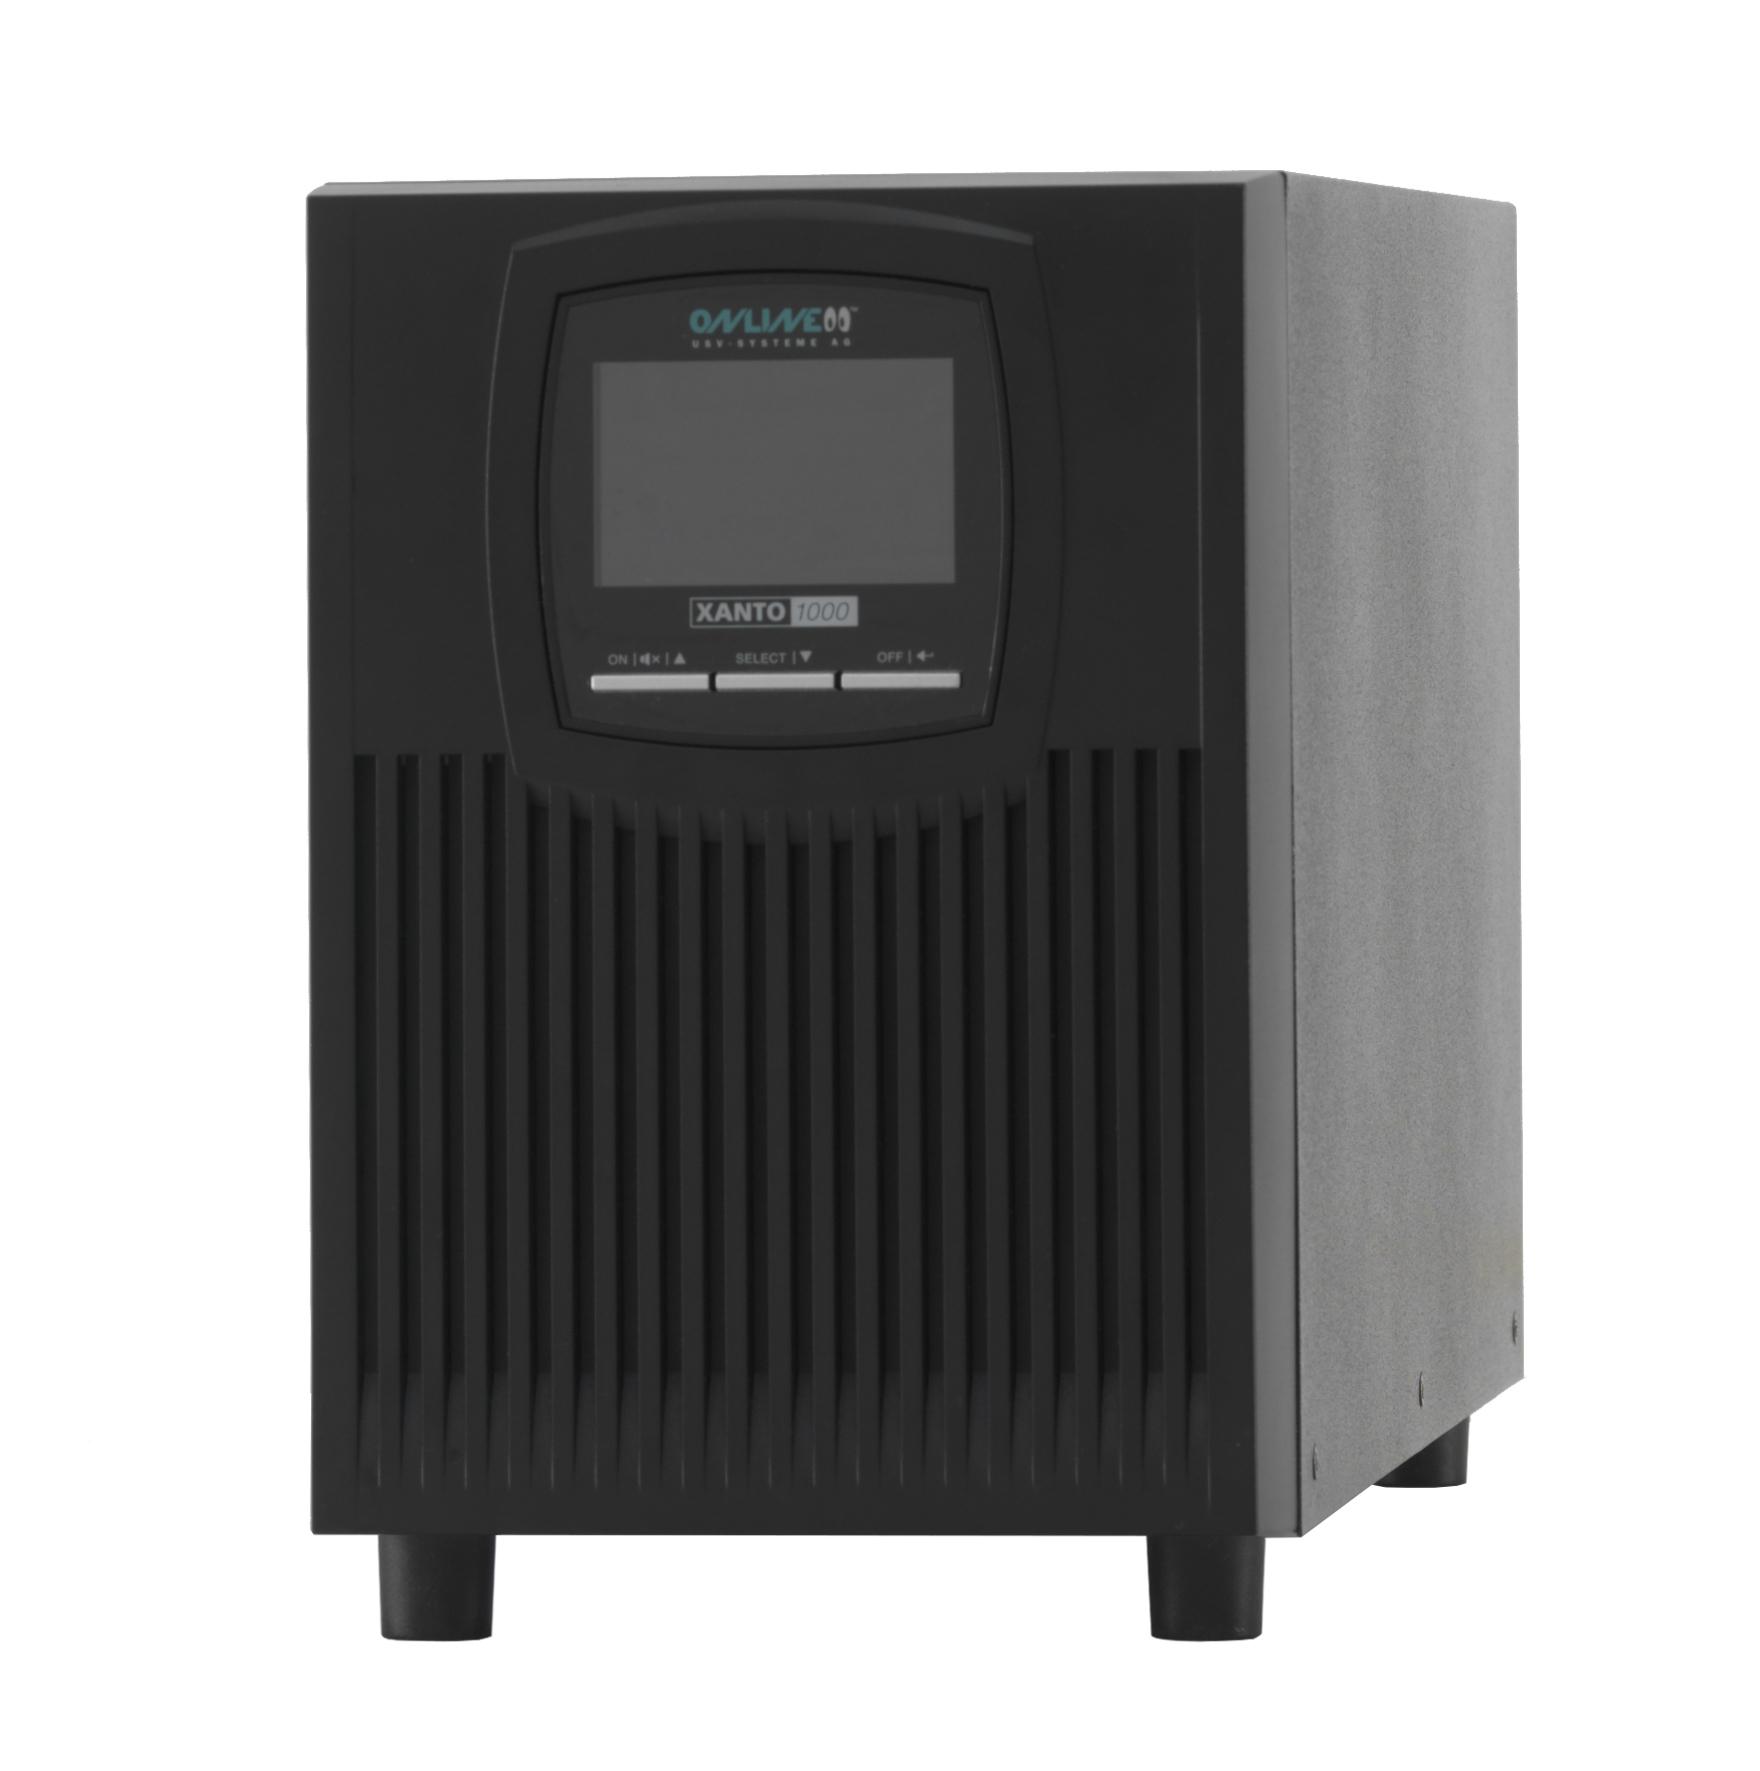 ONLINE USV-Systeme XANTO 1000 uninterruptible power supply (UPS) Double-conversion (Online) 1000 VA